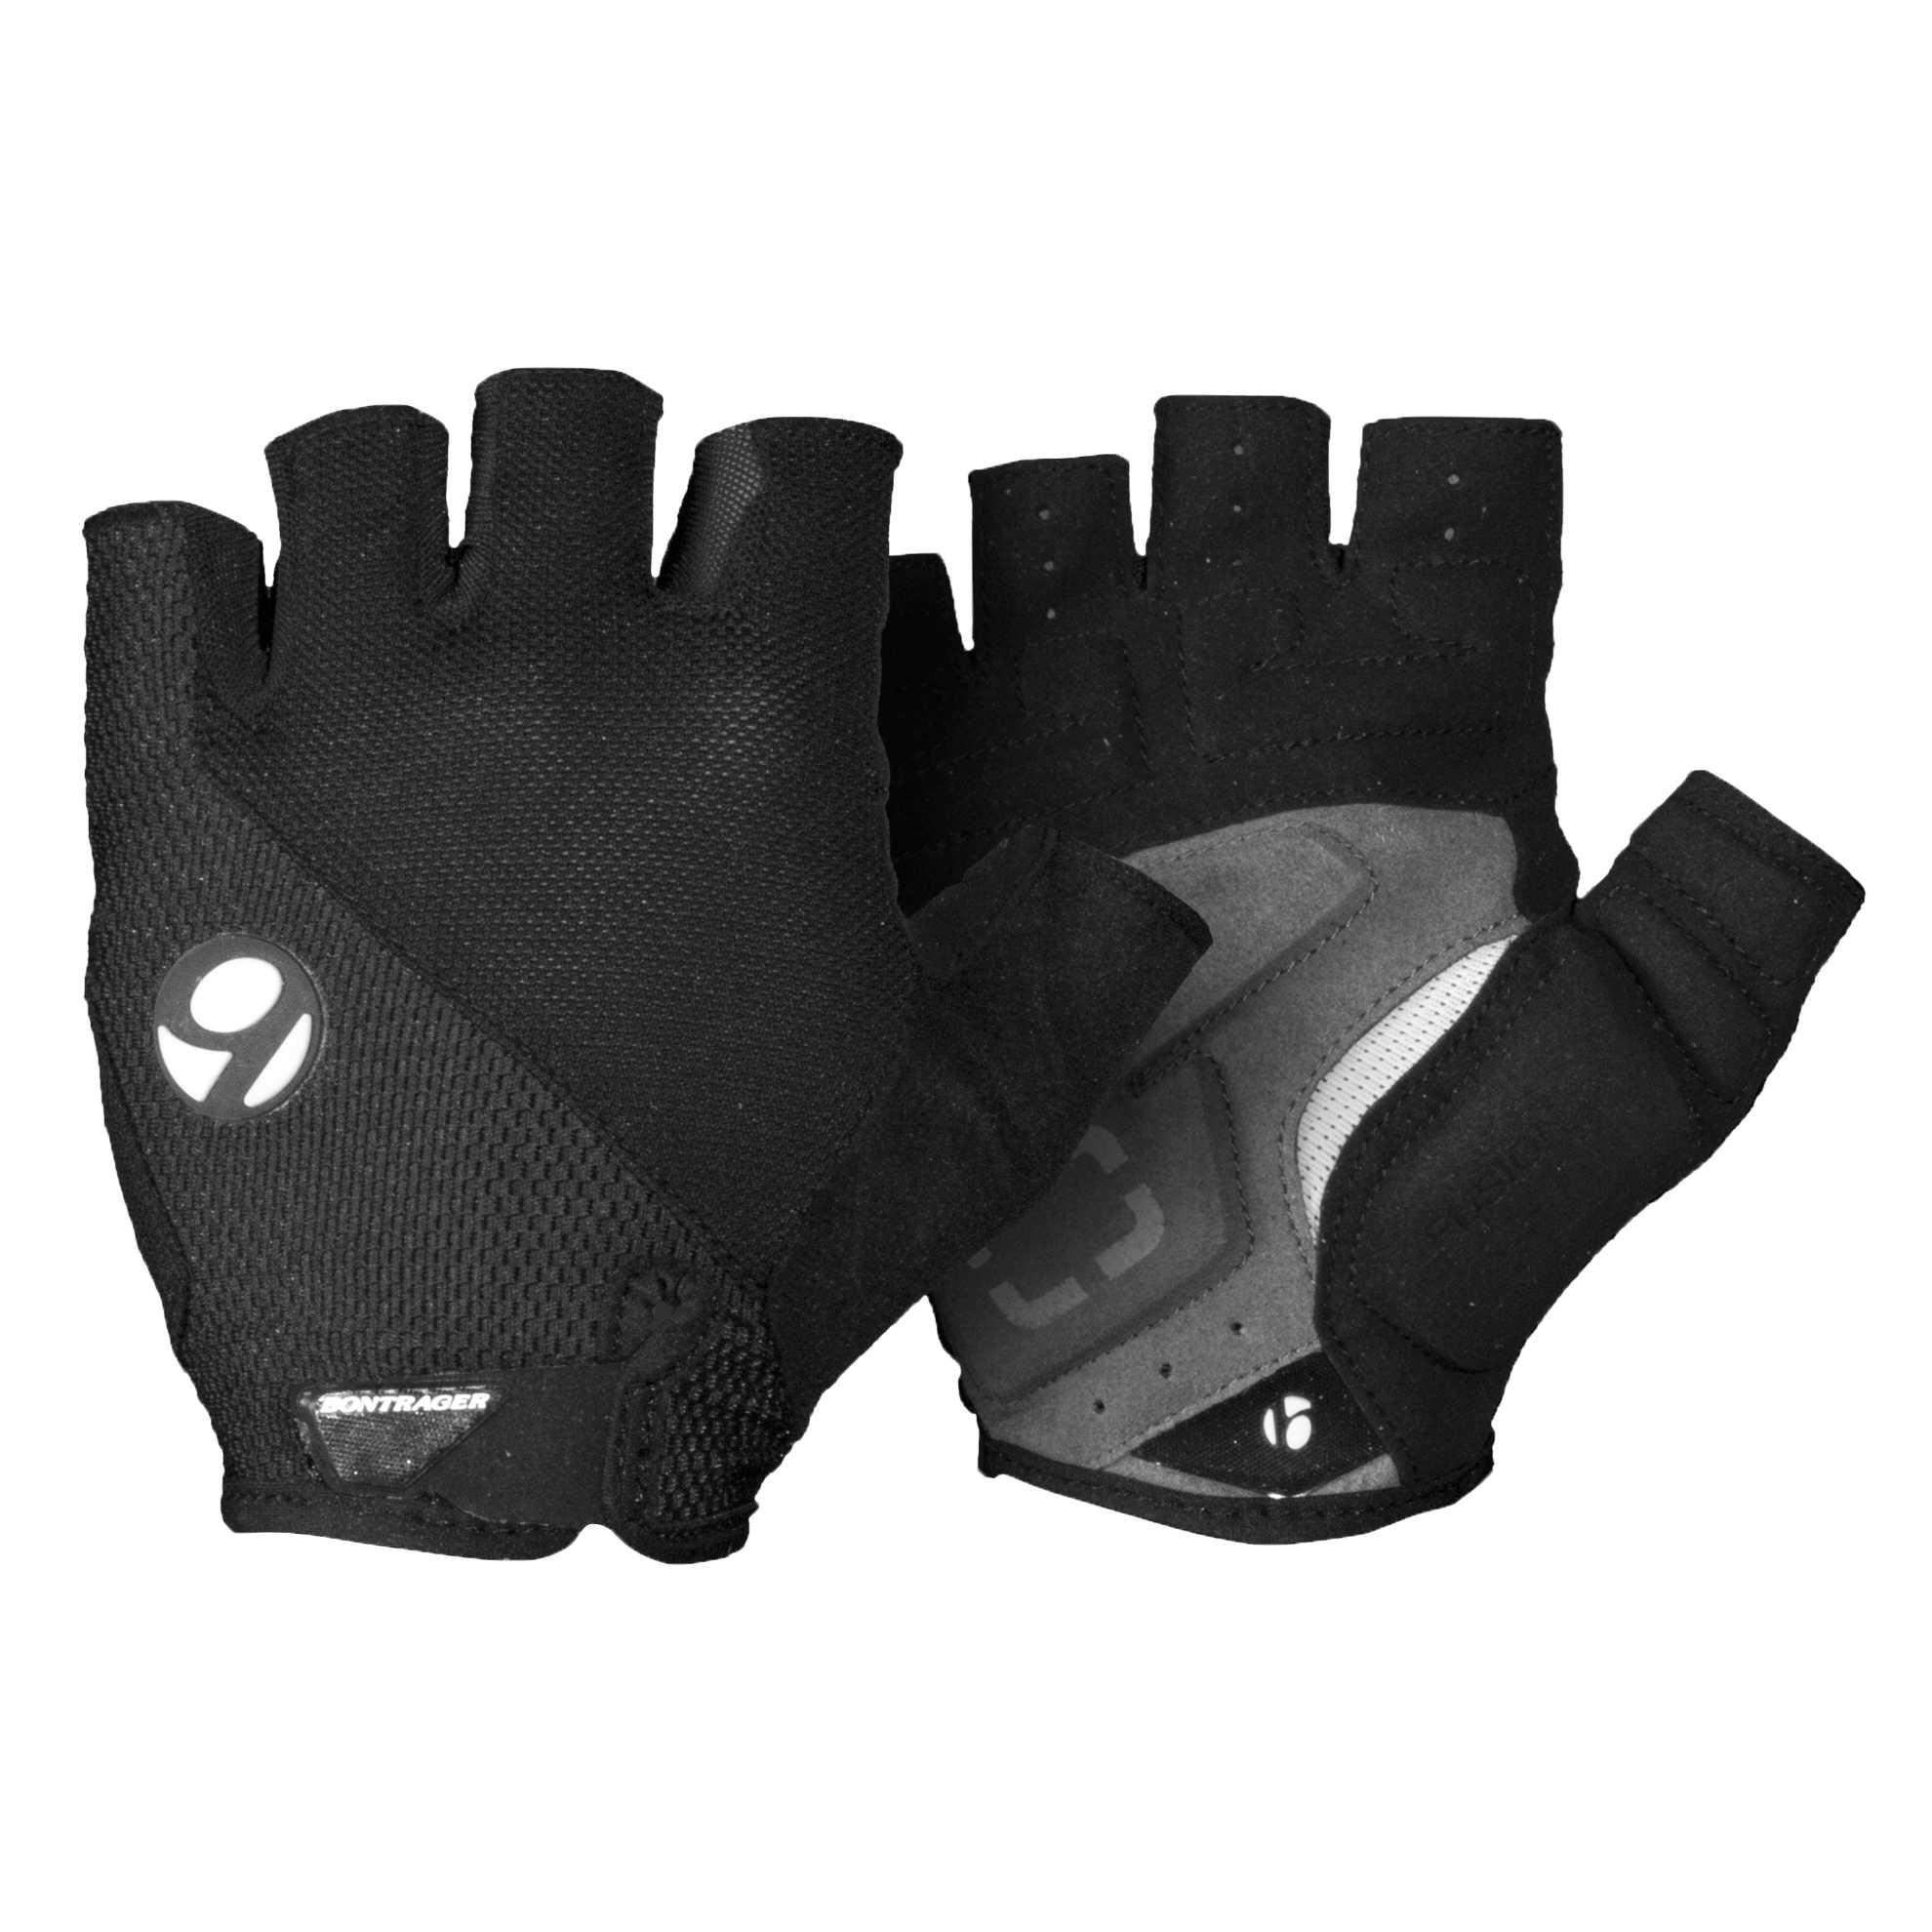 Black gloves races - Bontrager Race Gel Cycling Glove